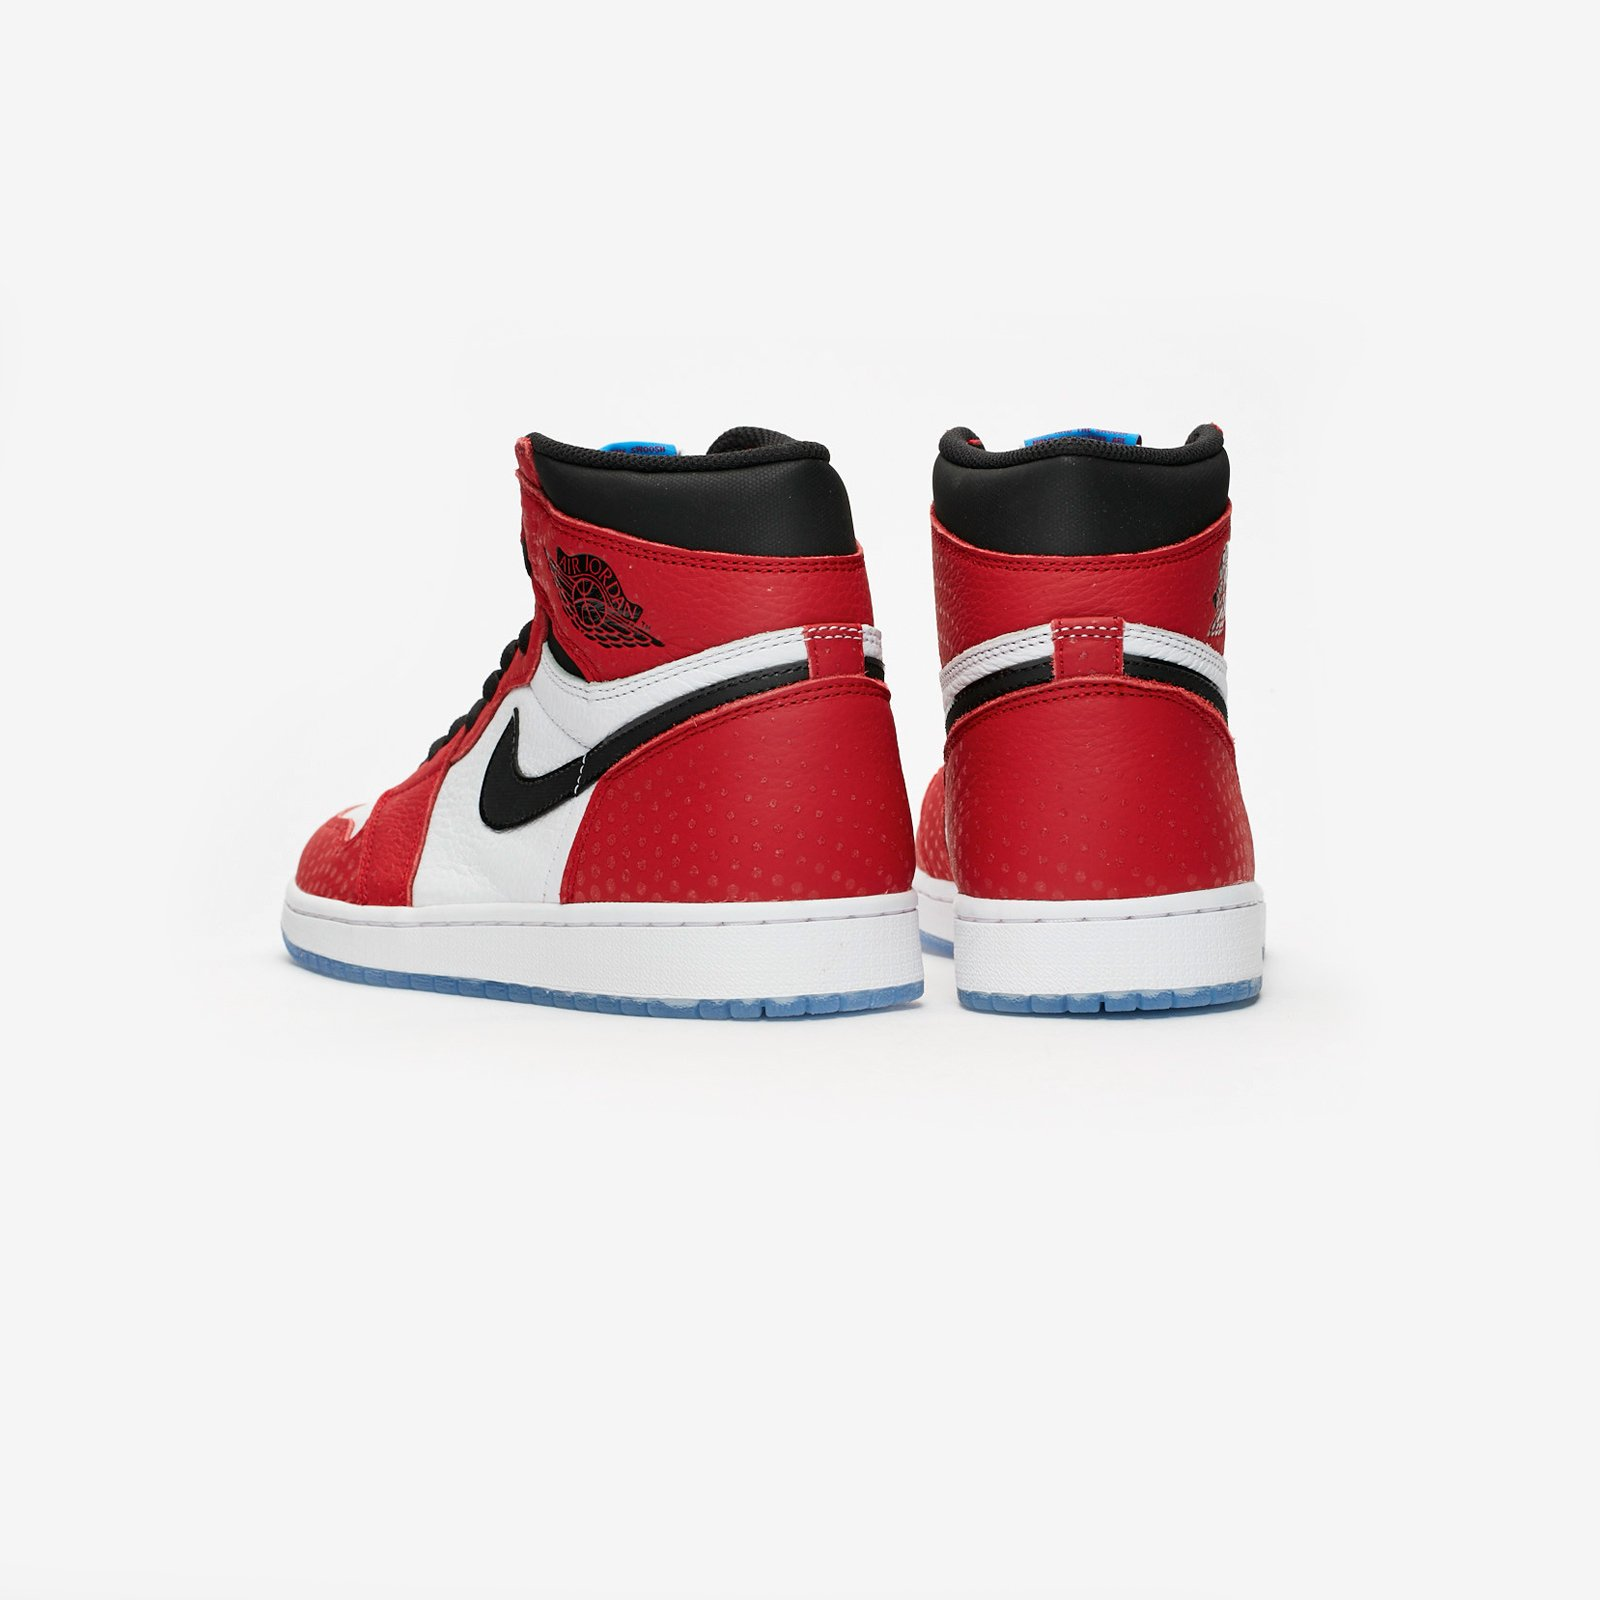 a4dc4bb26199f4 Jordan Brand Air Jordan 1 Retro High OG - 555088-602 - Sneakersnstuff